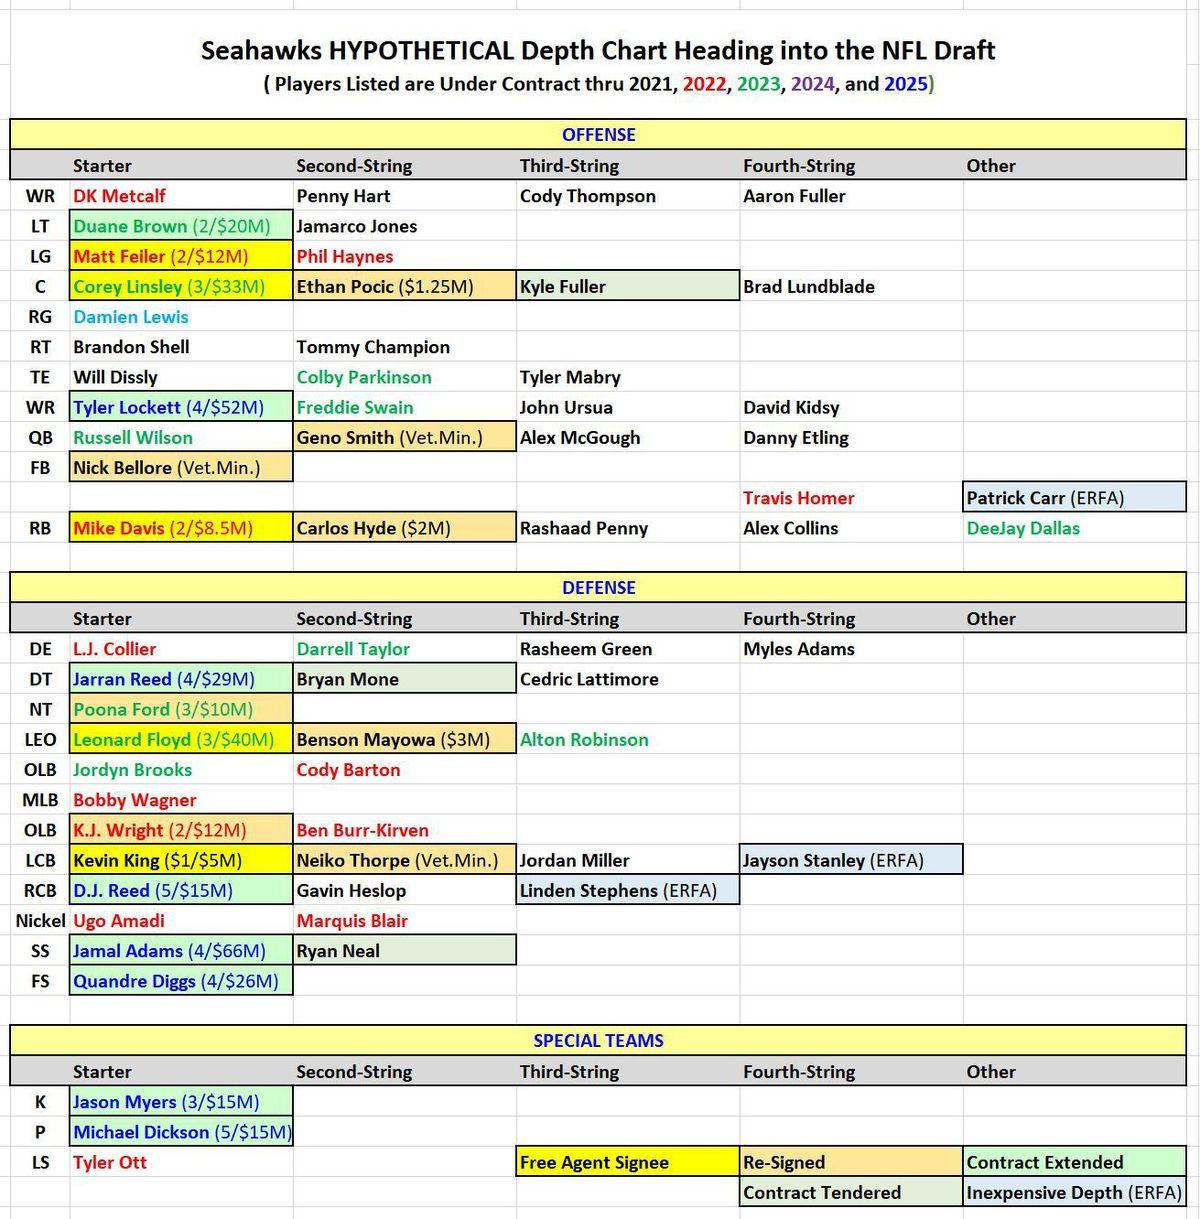 Seahawks Depth Chart heading into Draft Week (HYPOTHETICAL)